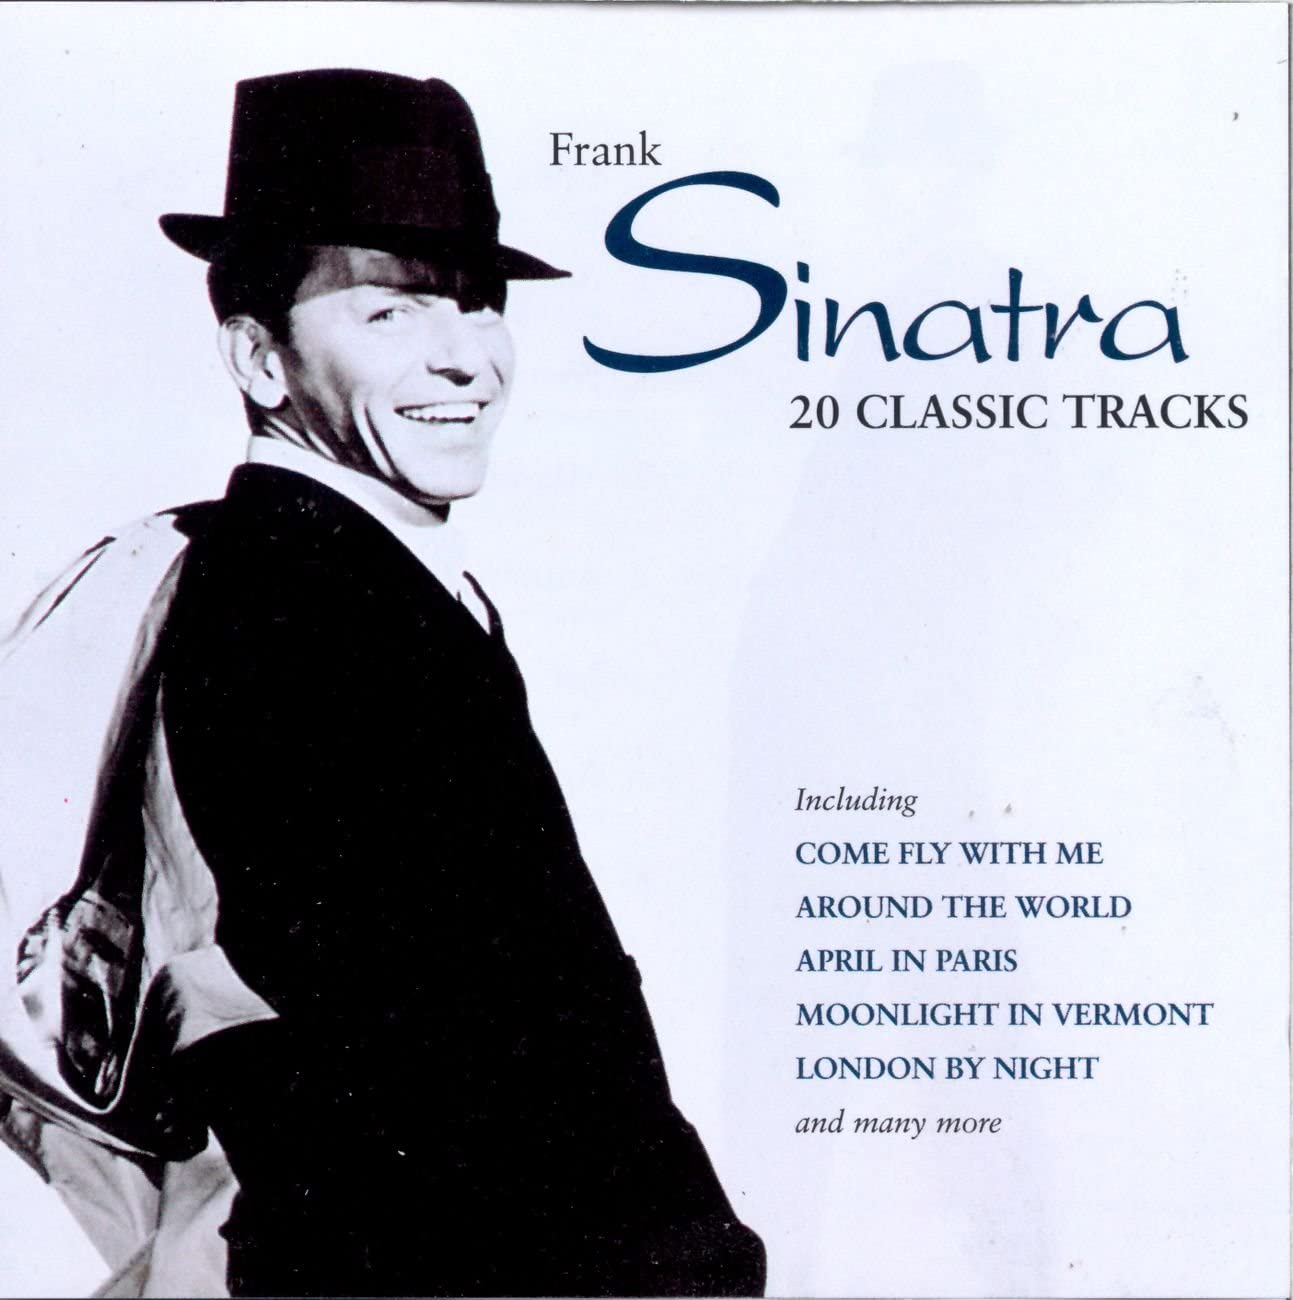 FRANK SINATRA - 20 CLASSIC TRACKS (CD)